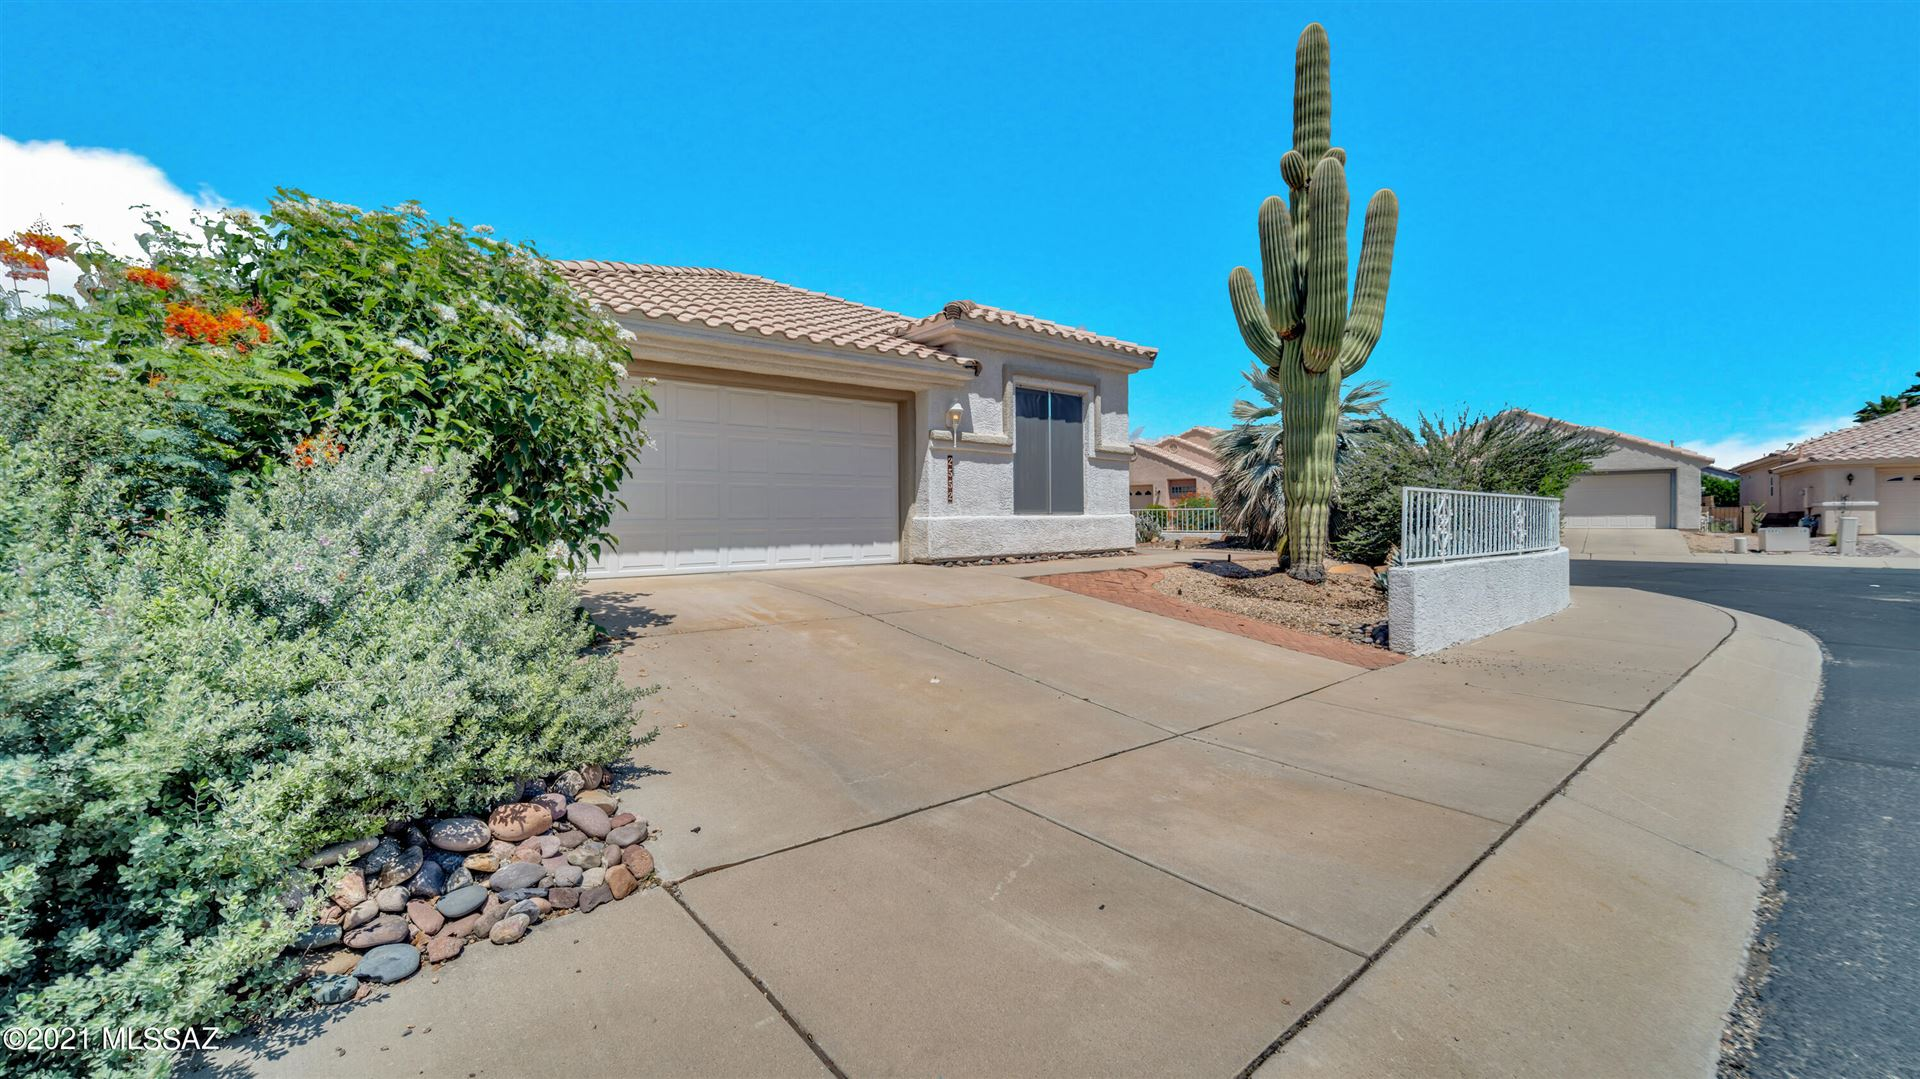 2552 S Rita Vista Drive, Green Valley, AZ 85614 - MLS#: 22121726